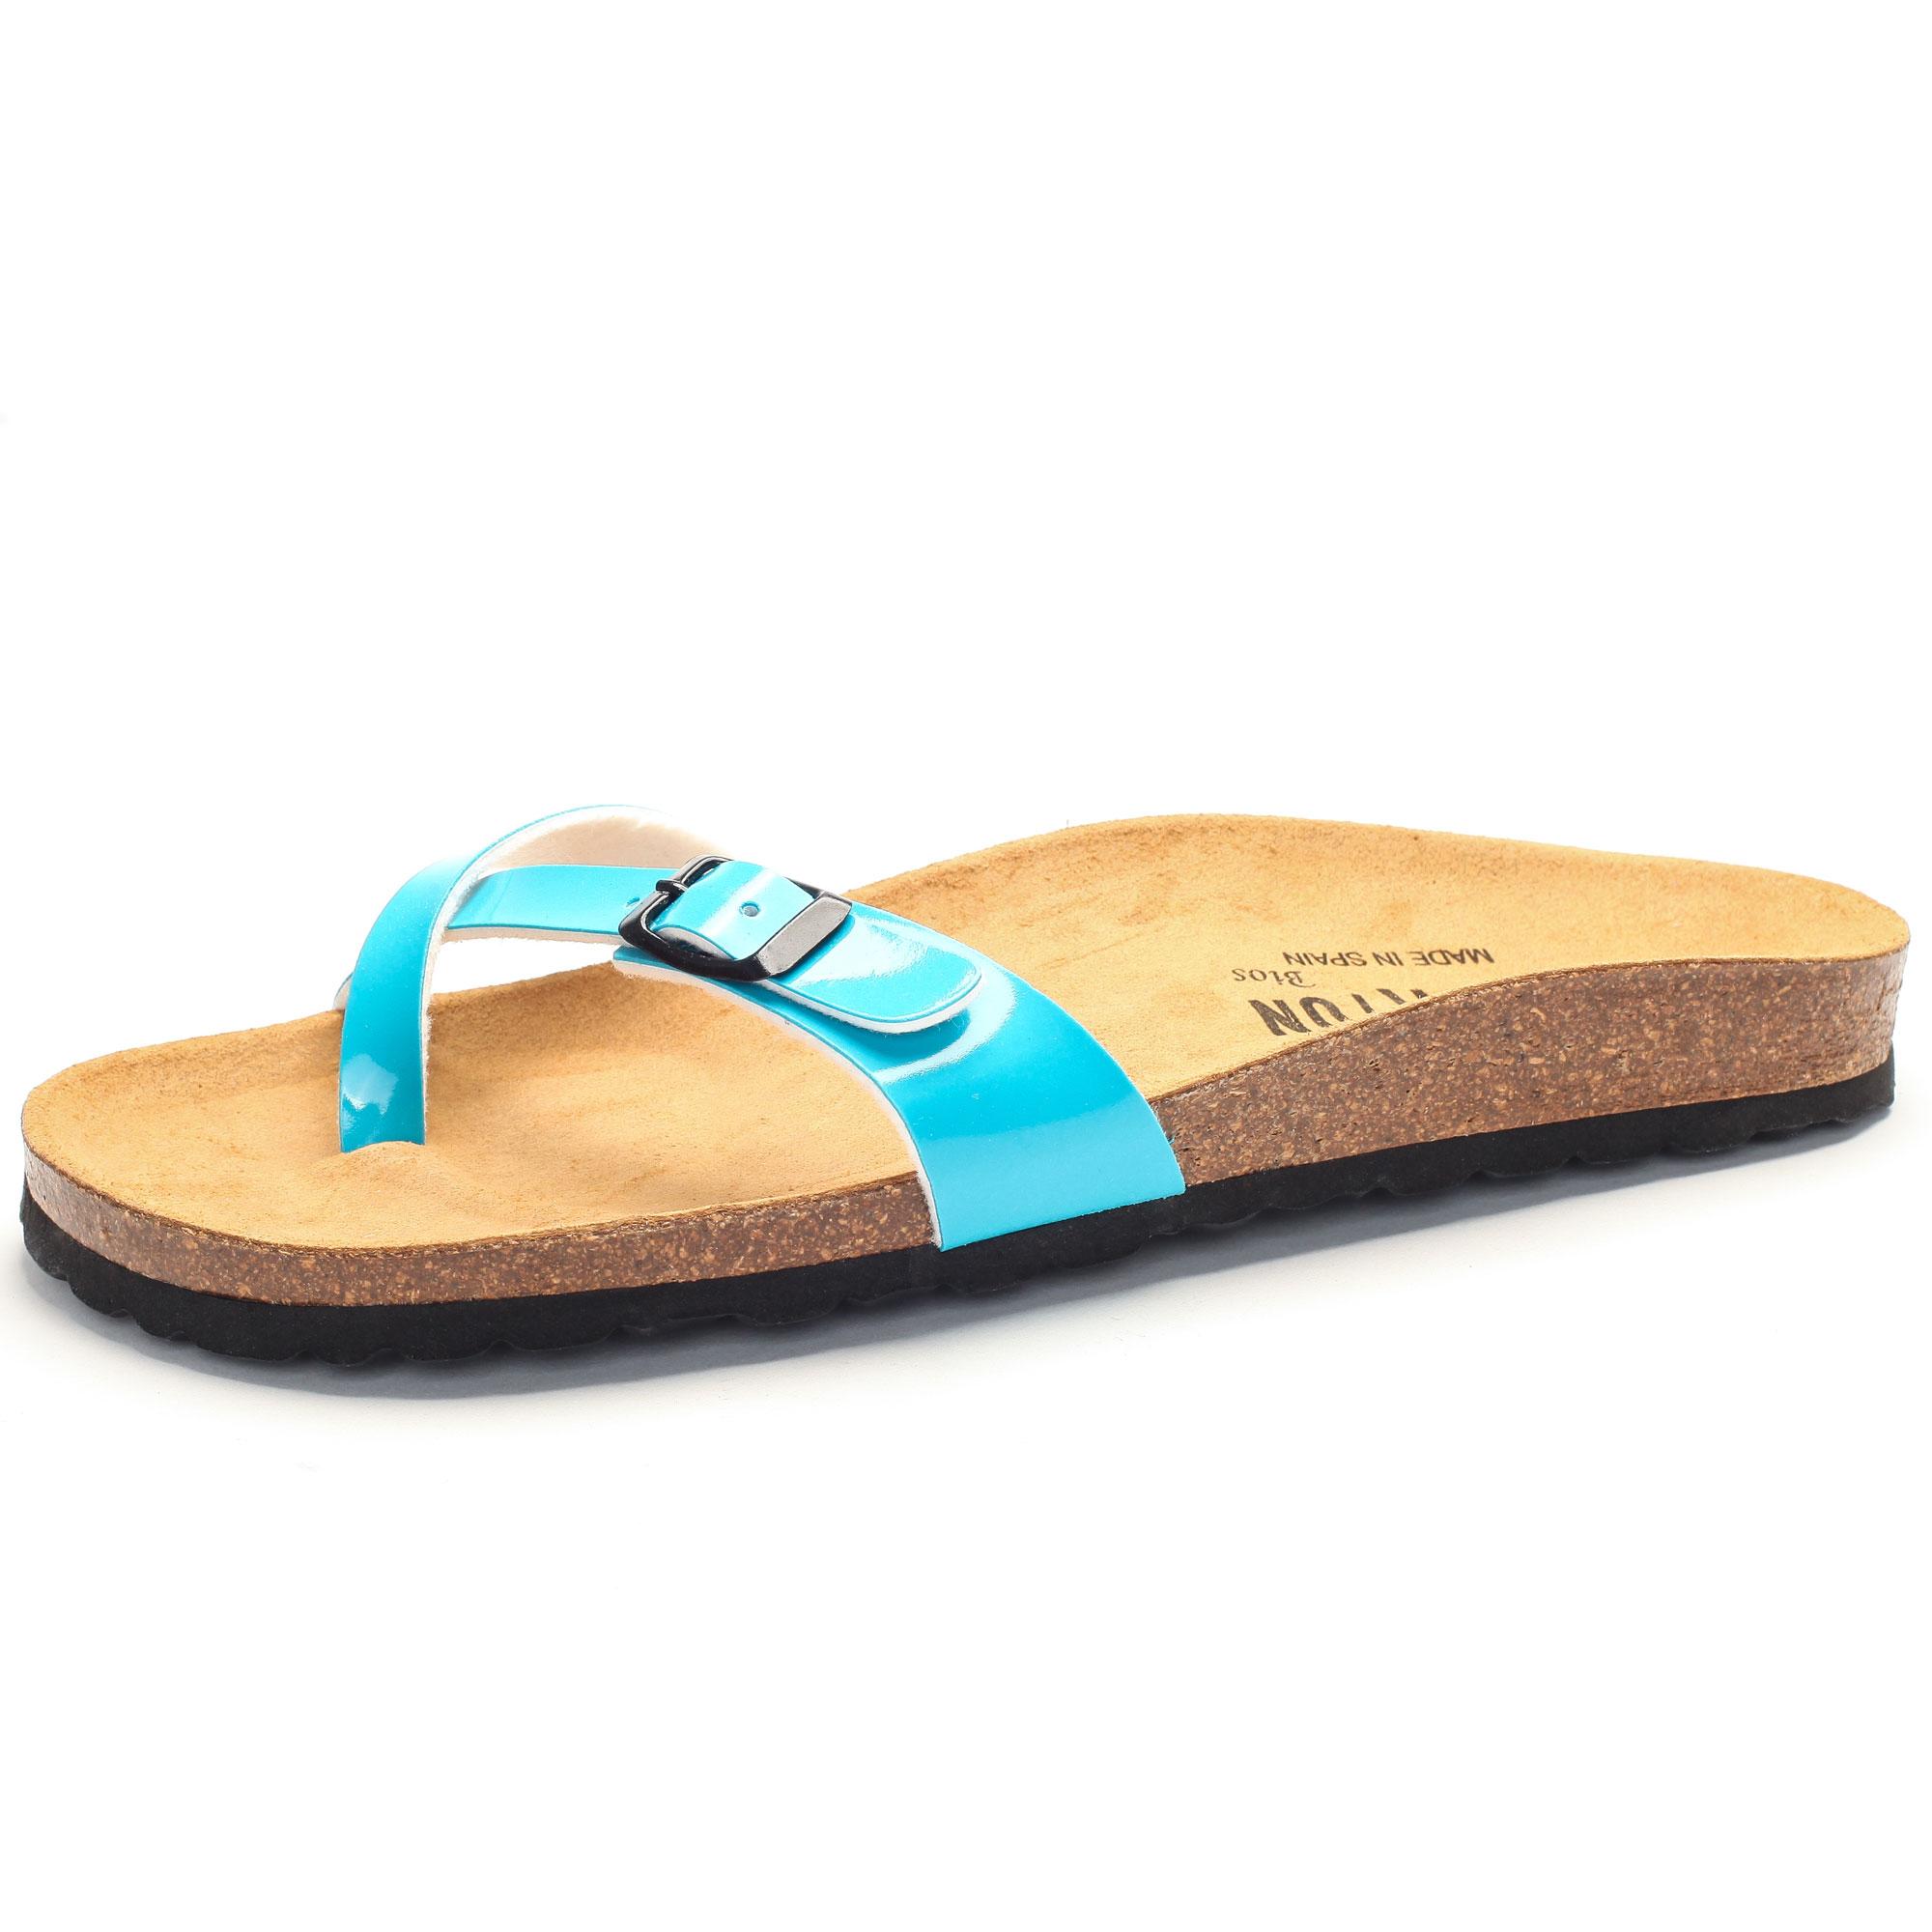 Zehensandale mit Fußbett charol sintetico aqua